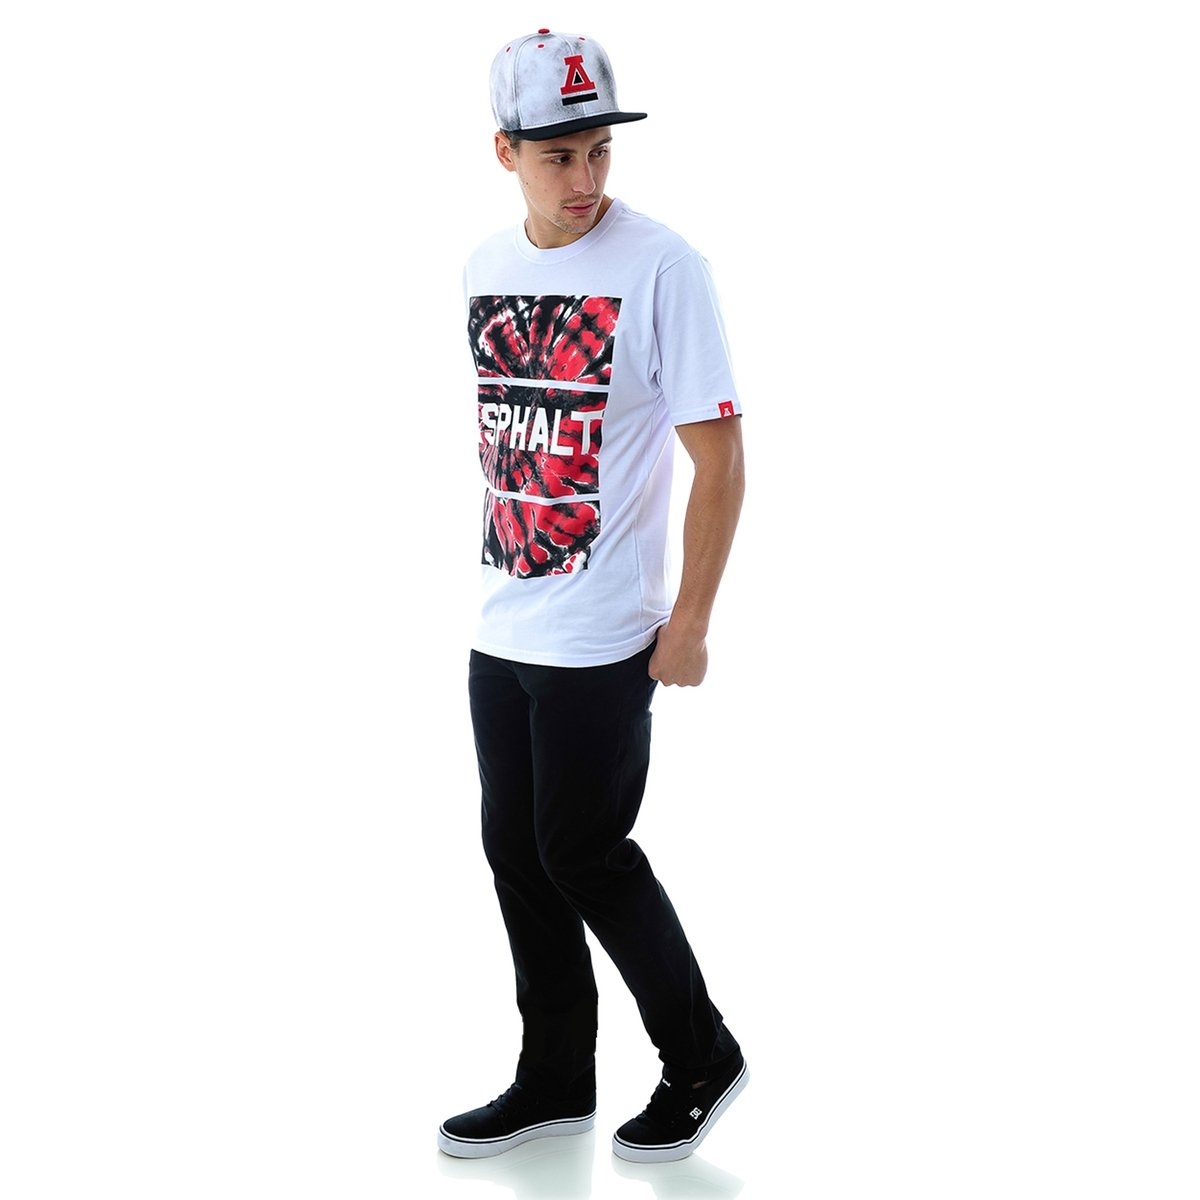 Camiseta Swirl Asphalt Camiseta Branco Tie Asphalt 5q8gv